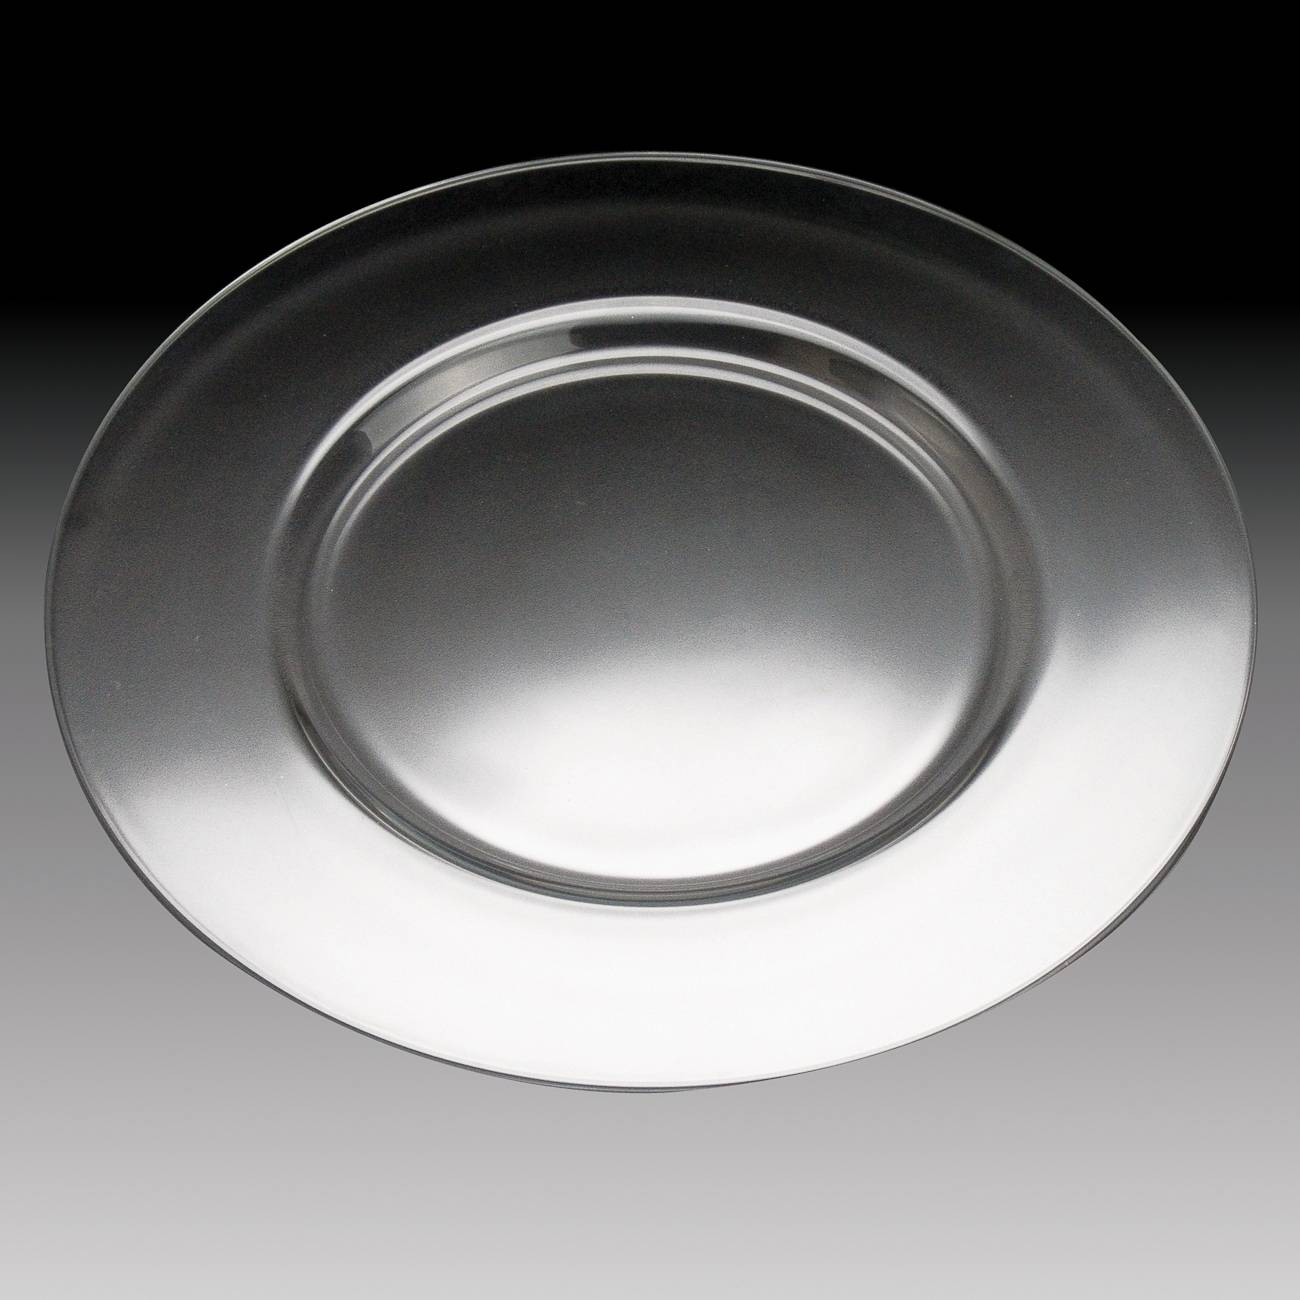 Sousplat Rialto em Vidro - Caldier - 35 cm